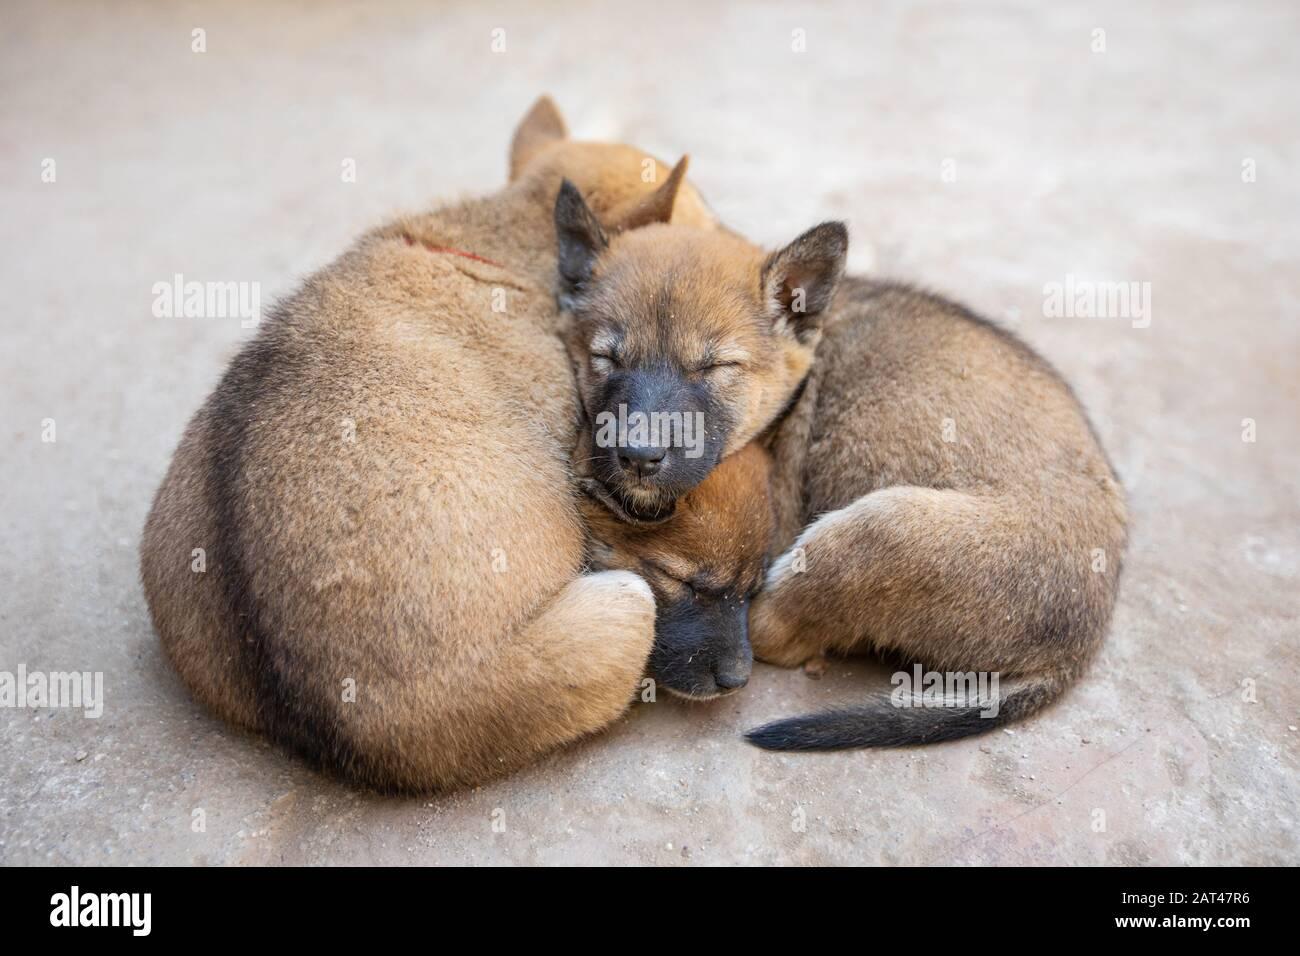 Cute Dog Puppies Sleeping On The Street Stock Photo Alamy